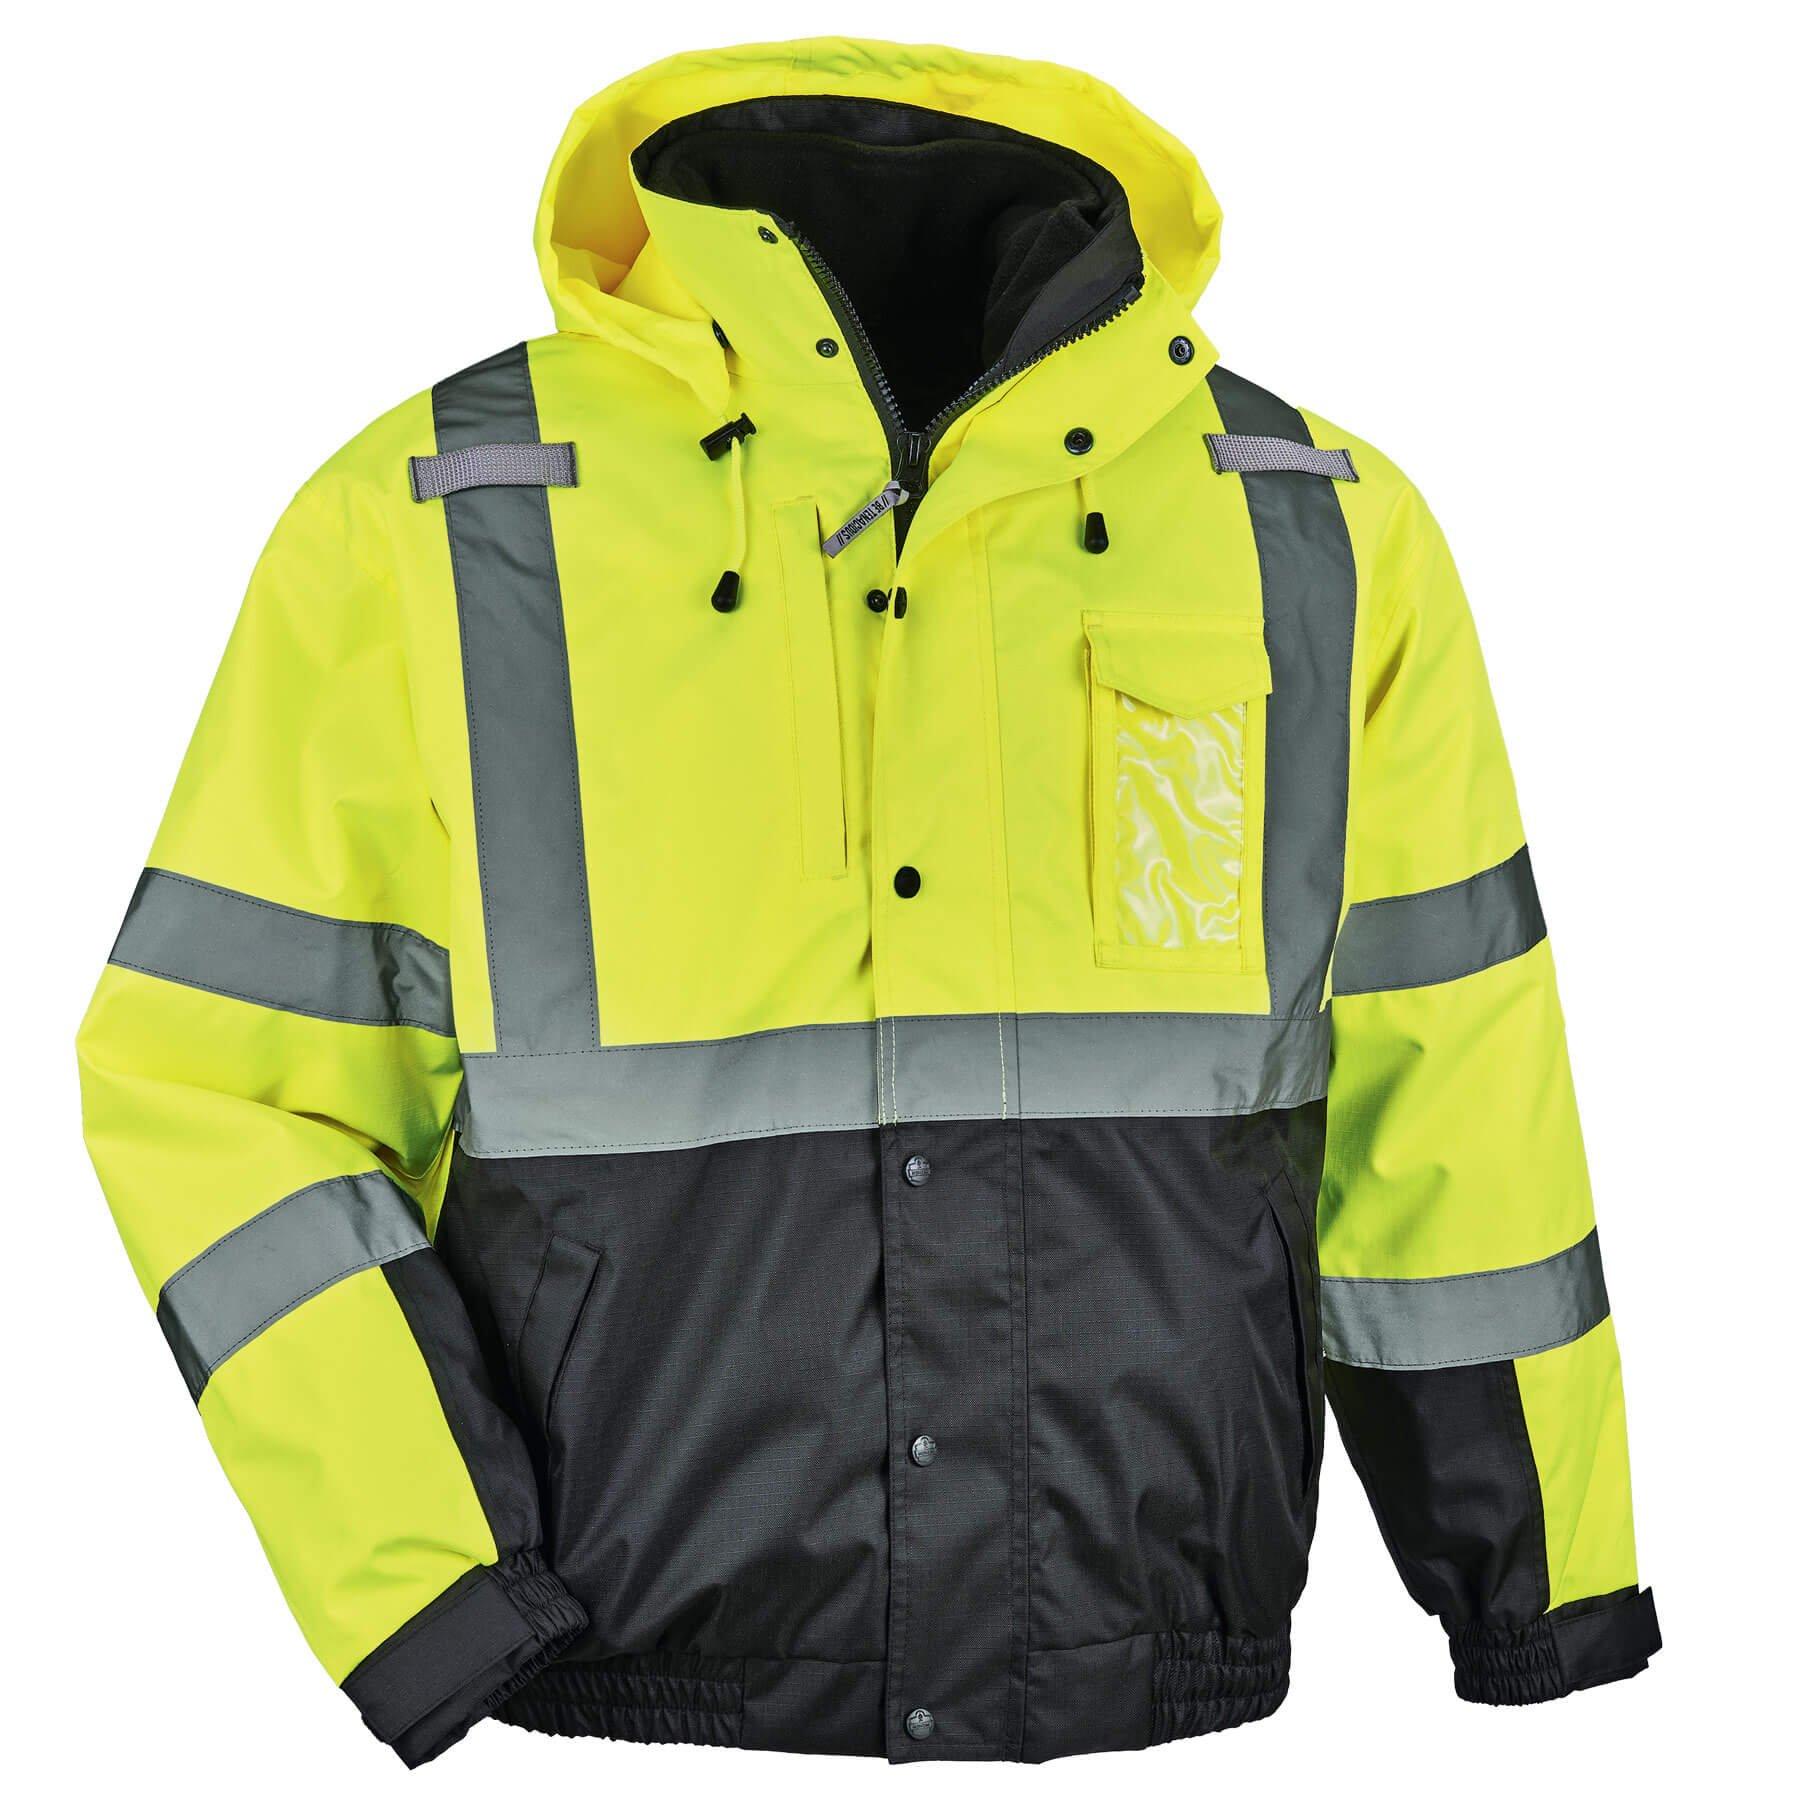 Ergodyne GloWear 8381 High Visibility Reflective Bomber Jacket with Zip-Out Black Fleece, Large, Lime